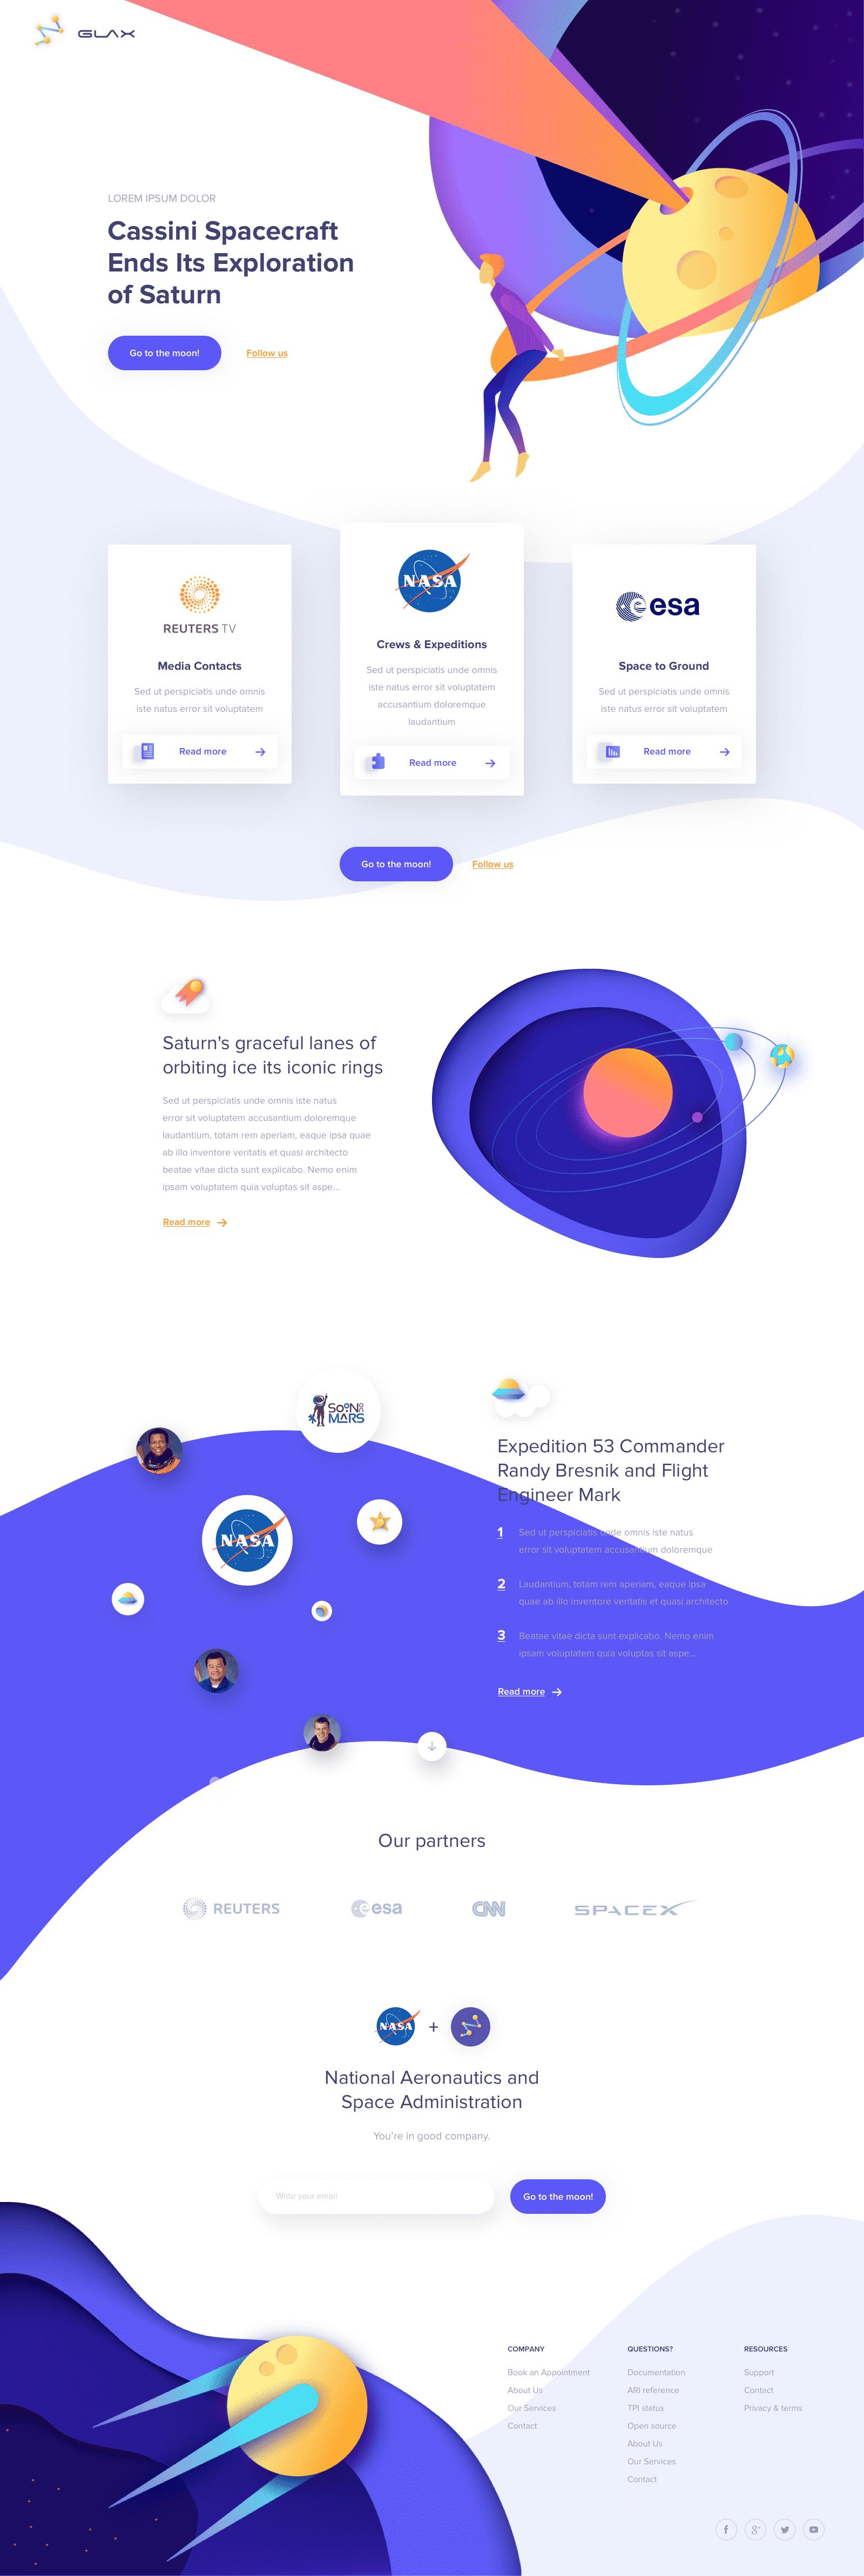 Glax / space / nasa website design inspiration